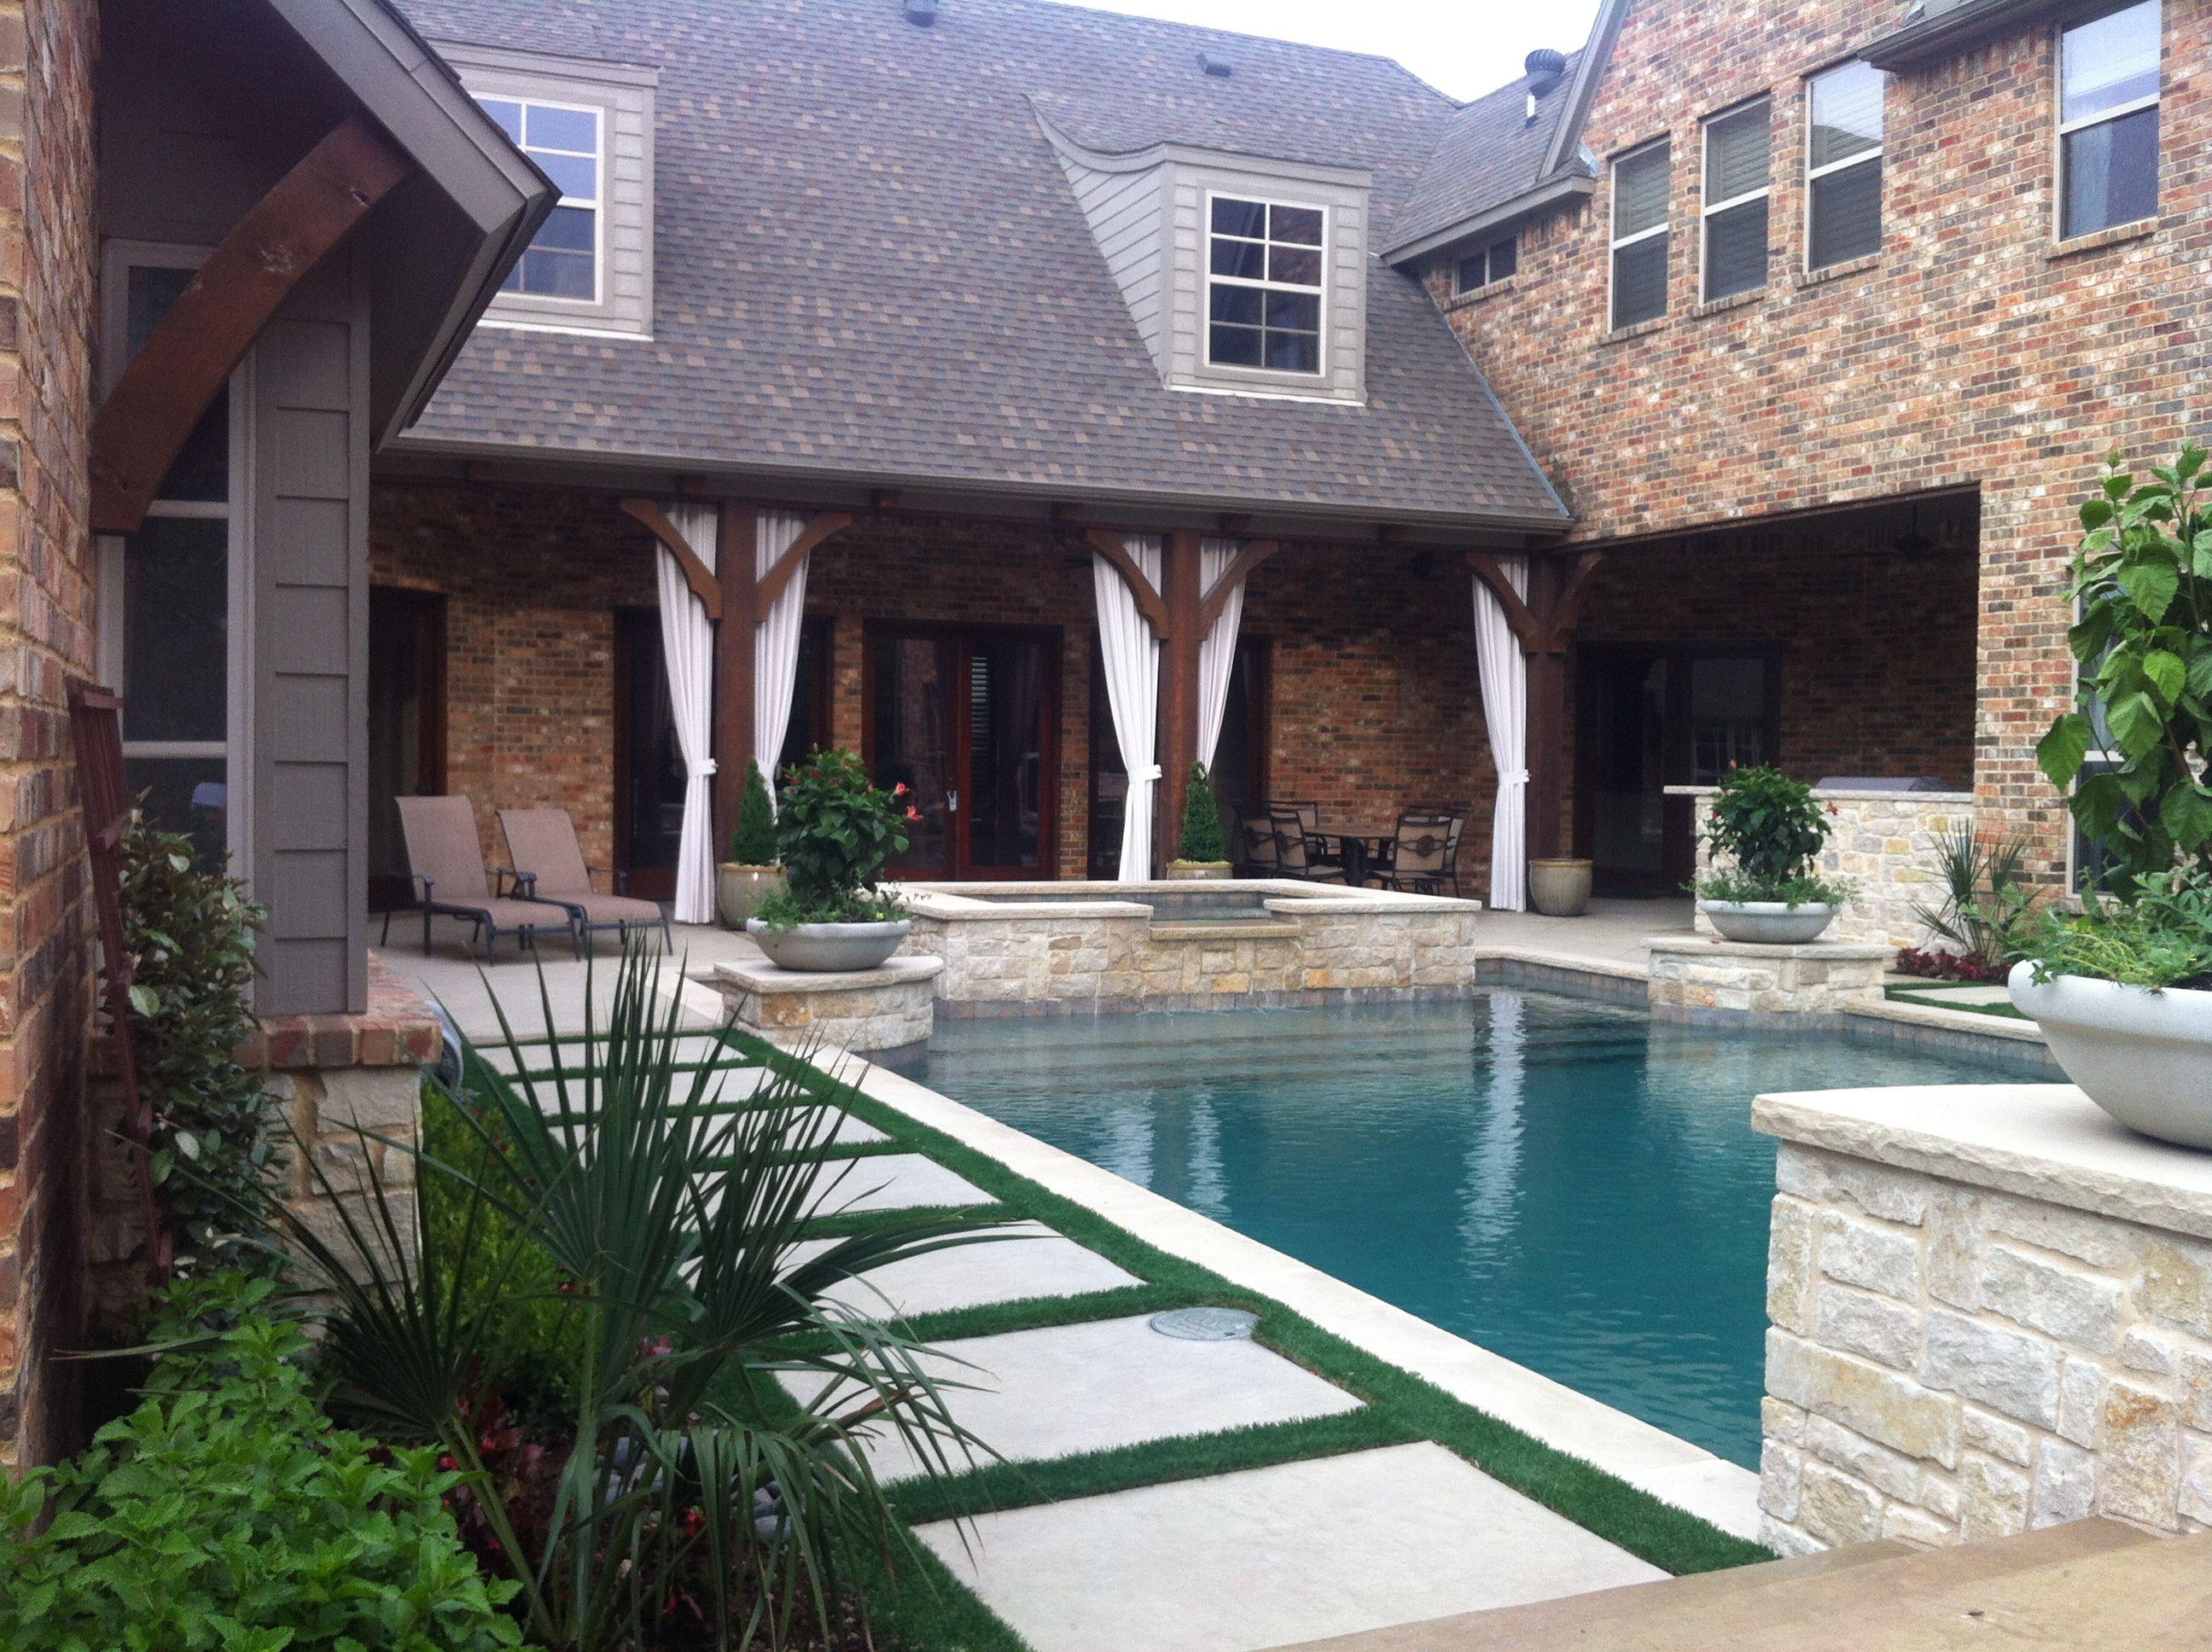 Backyard Pool With Artificial Turf Around Stepping Pads Pool Houses Beautiful Pools Backyard